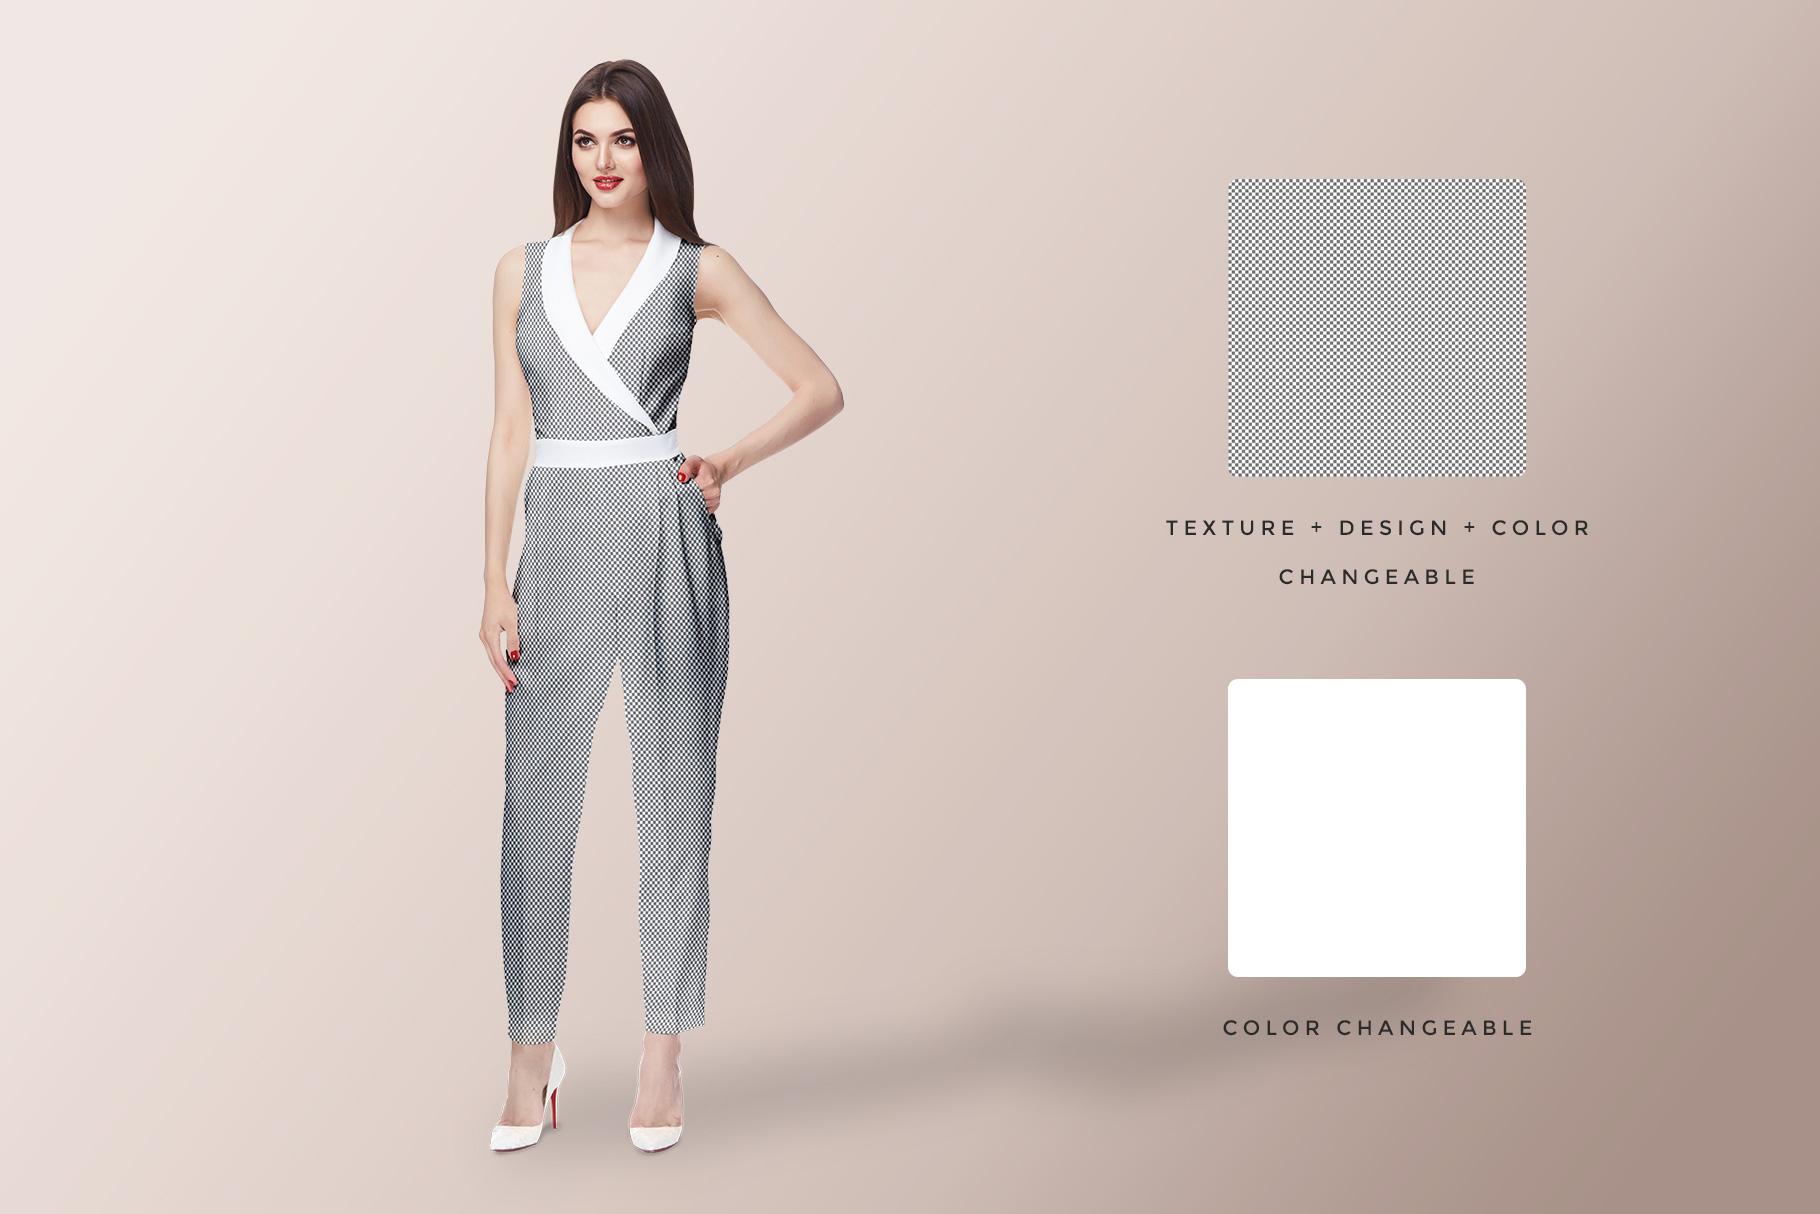 editability options of the women's jumpsuit mockup